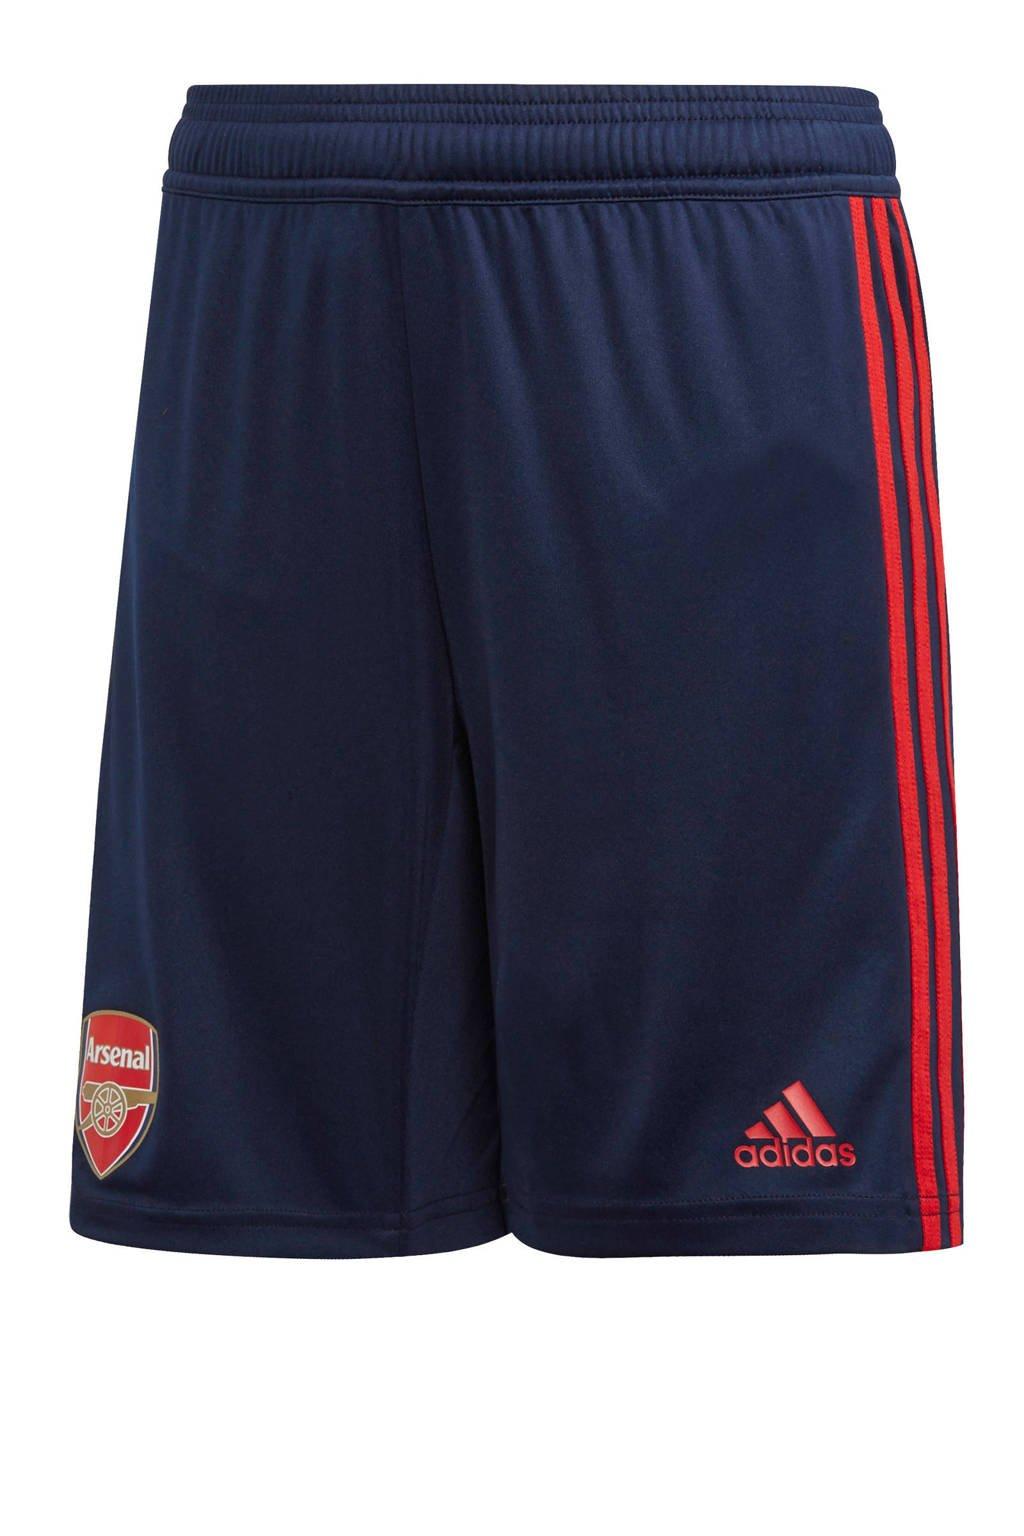 adidas Junior Arsenal FC voetbalshort, Donkerblauw/rood